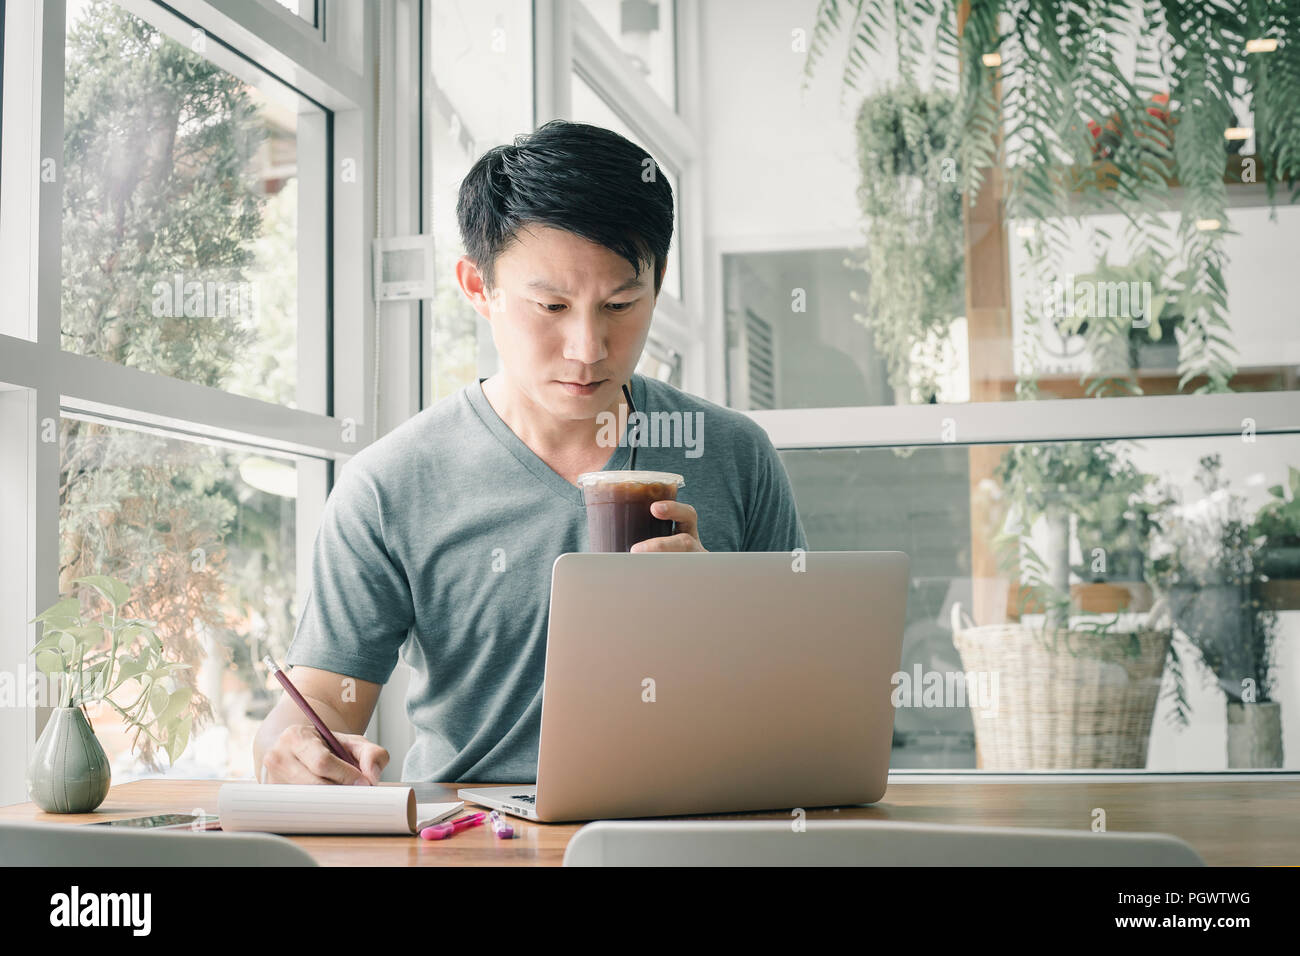 Freelancer Mann online Arbeiten an seinem Haus. Stockbild